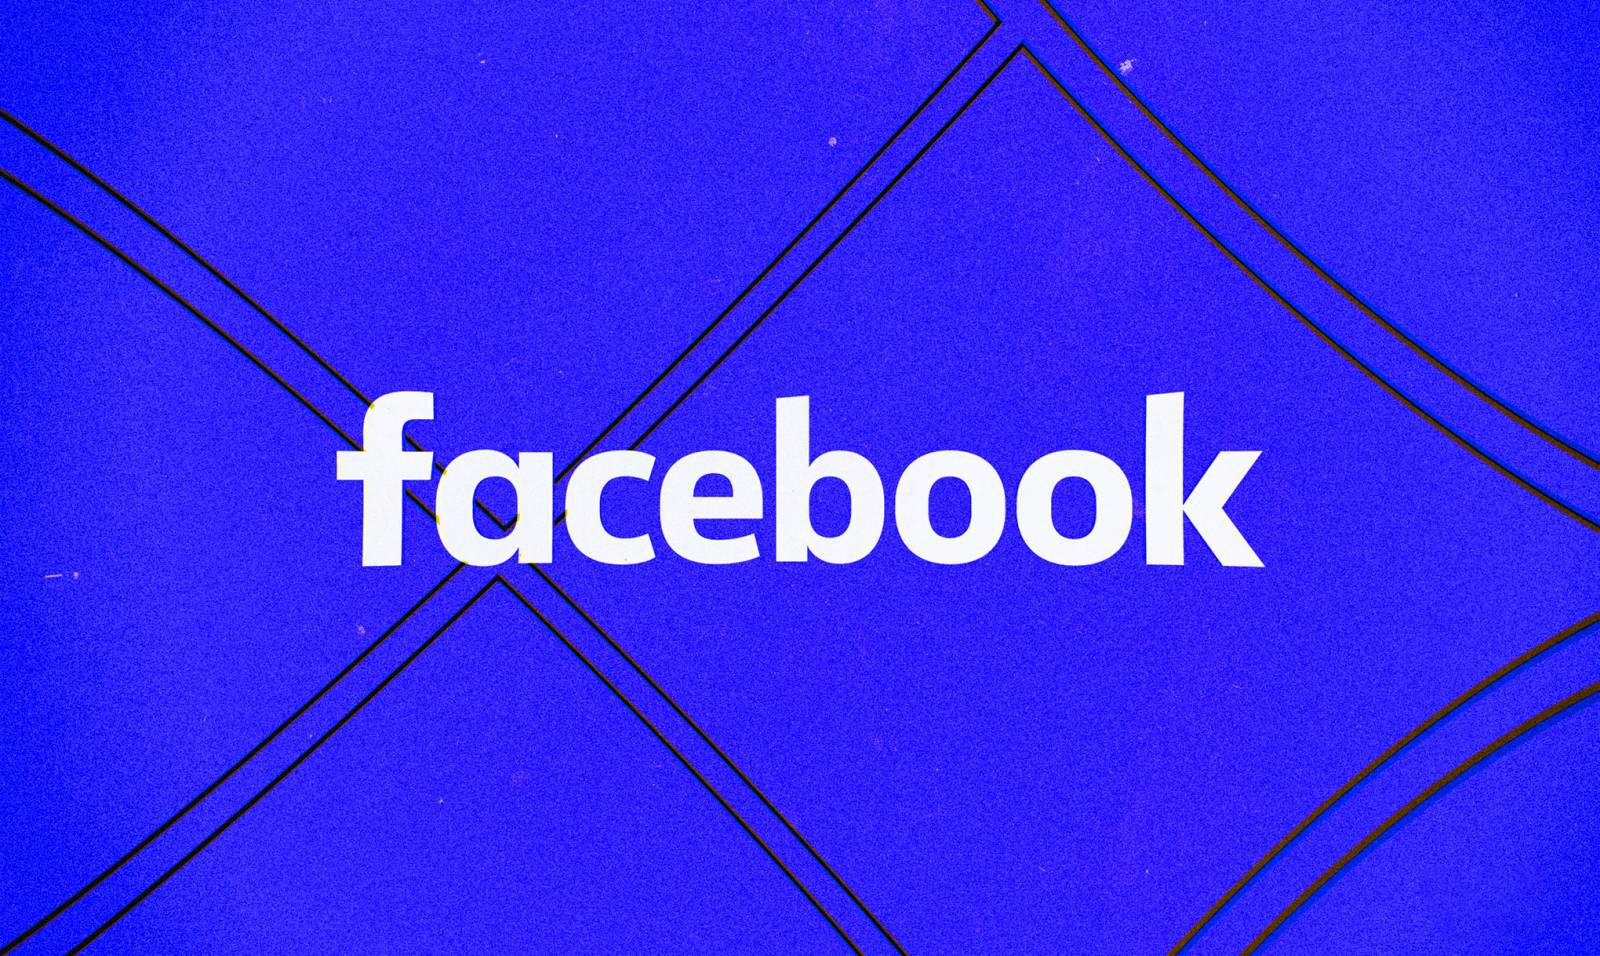 Facebook Noua Actualizare Lansata Schimbari Aduce Telefoane